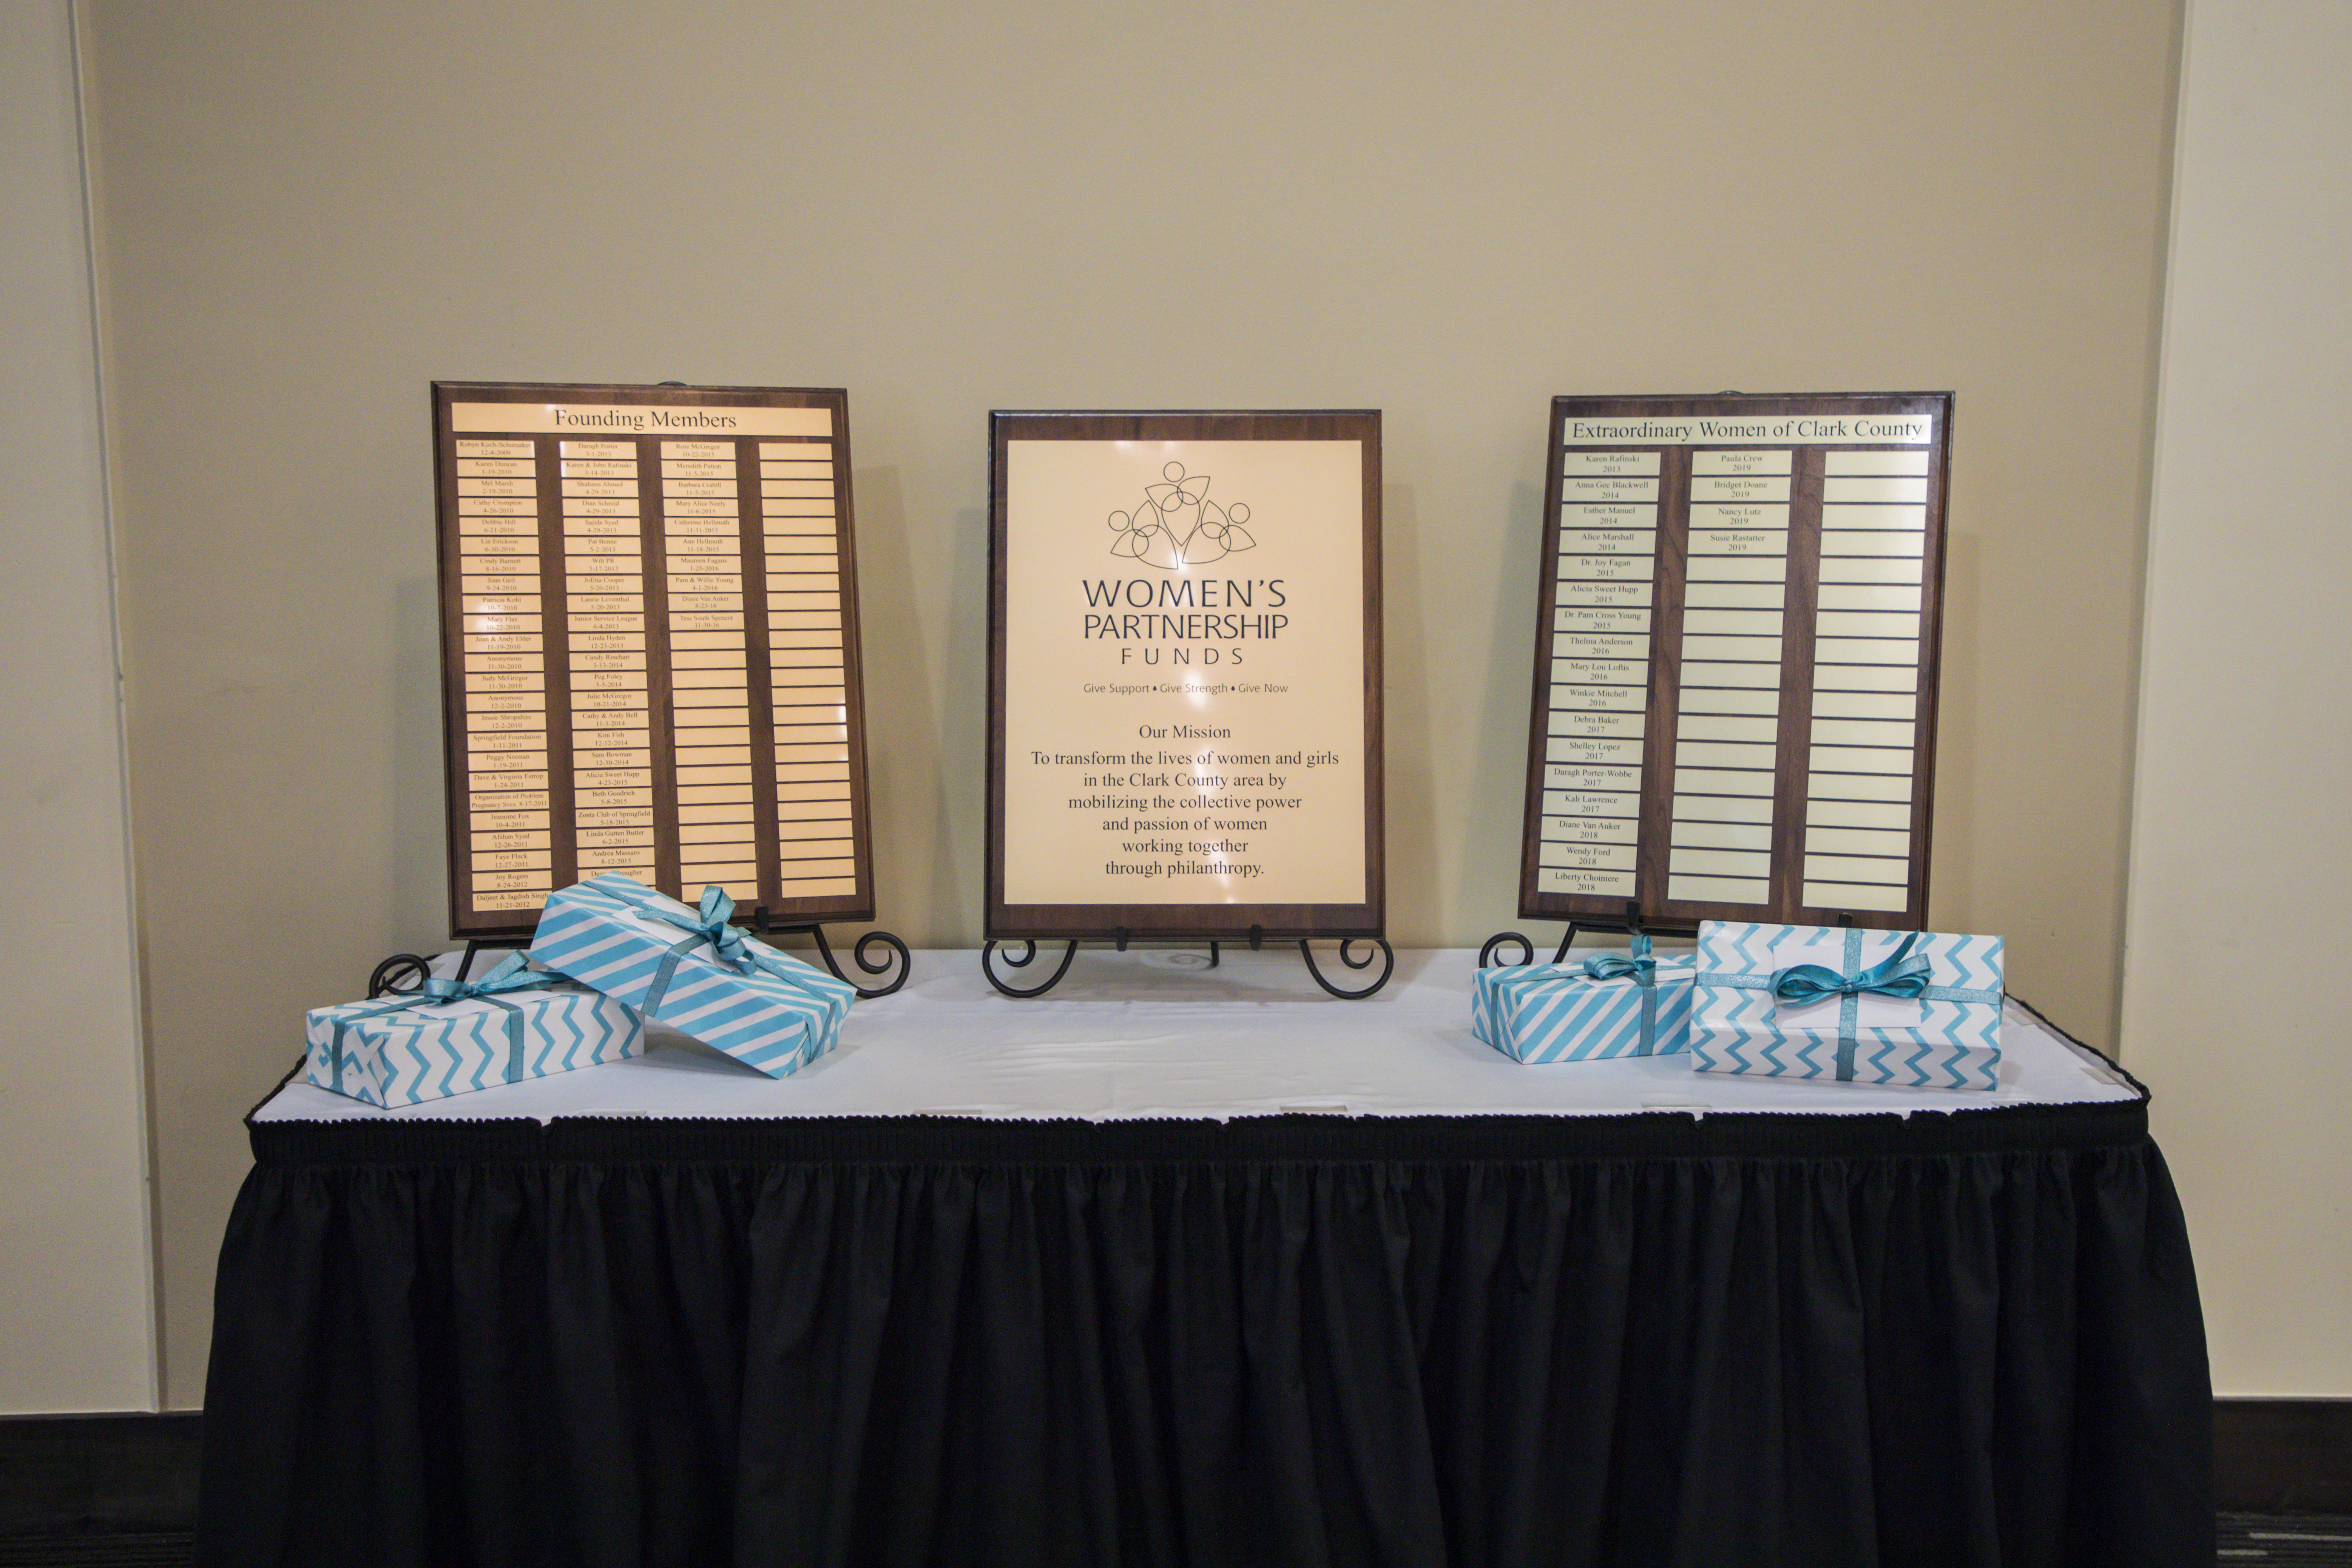 2020 Extraordinary Women of Clark County Nominations